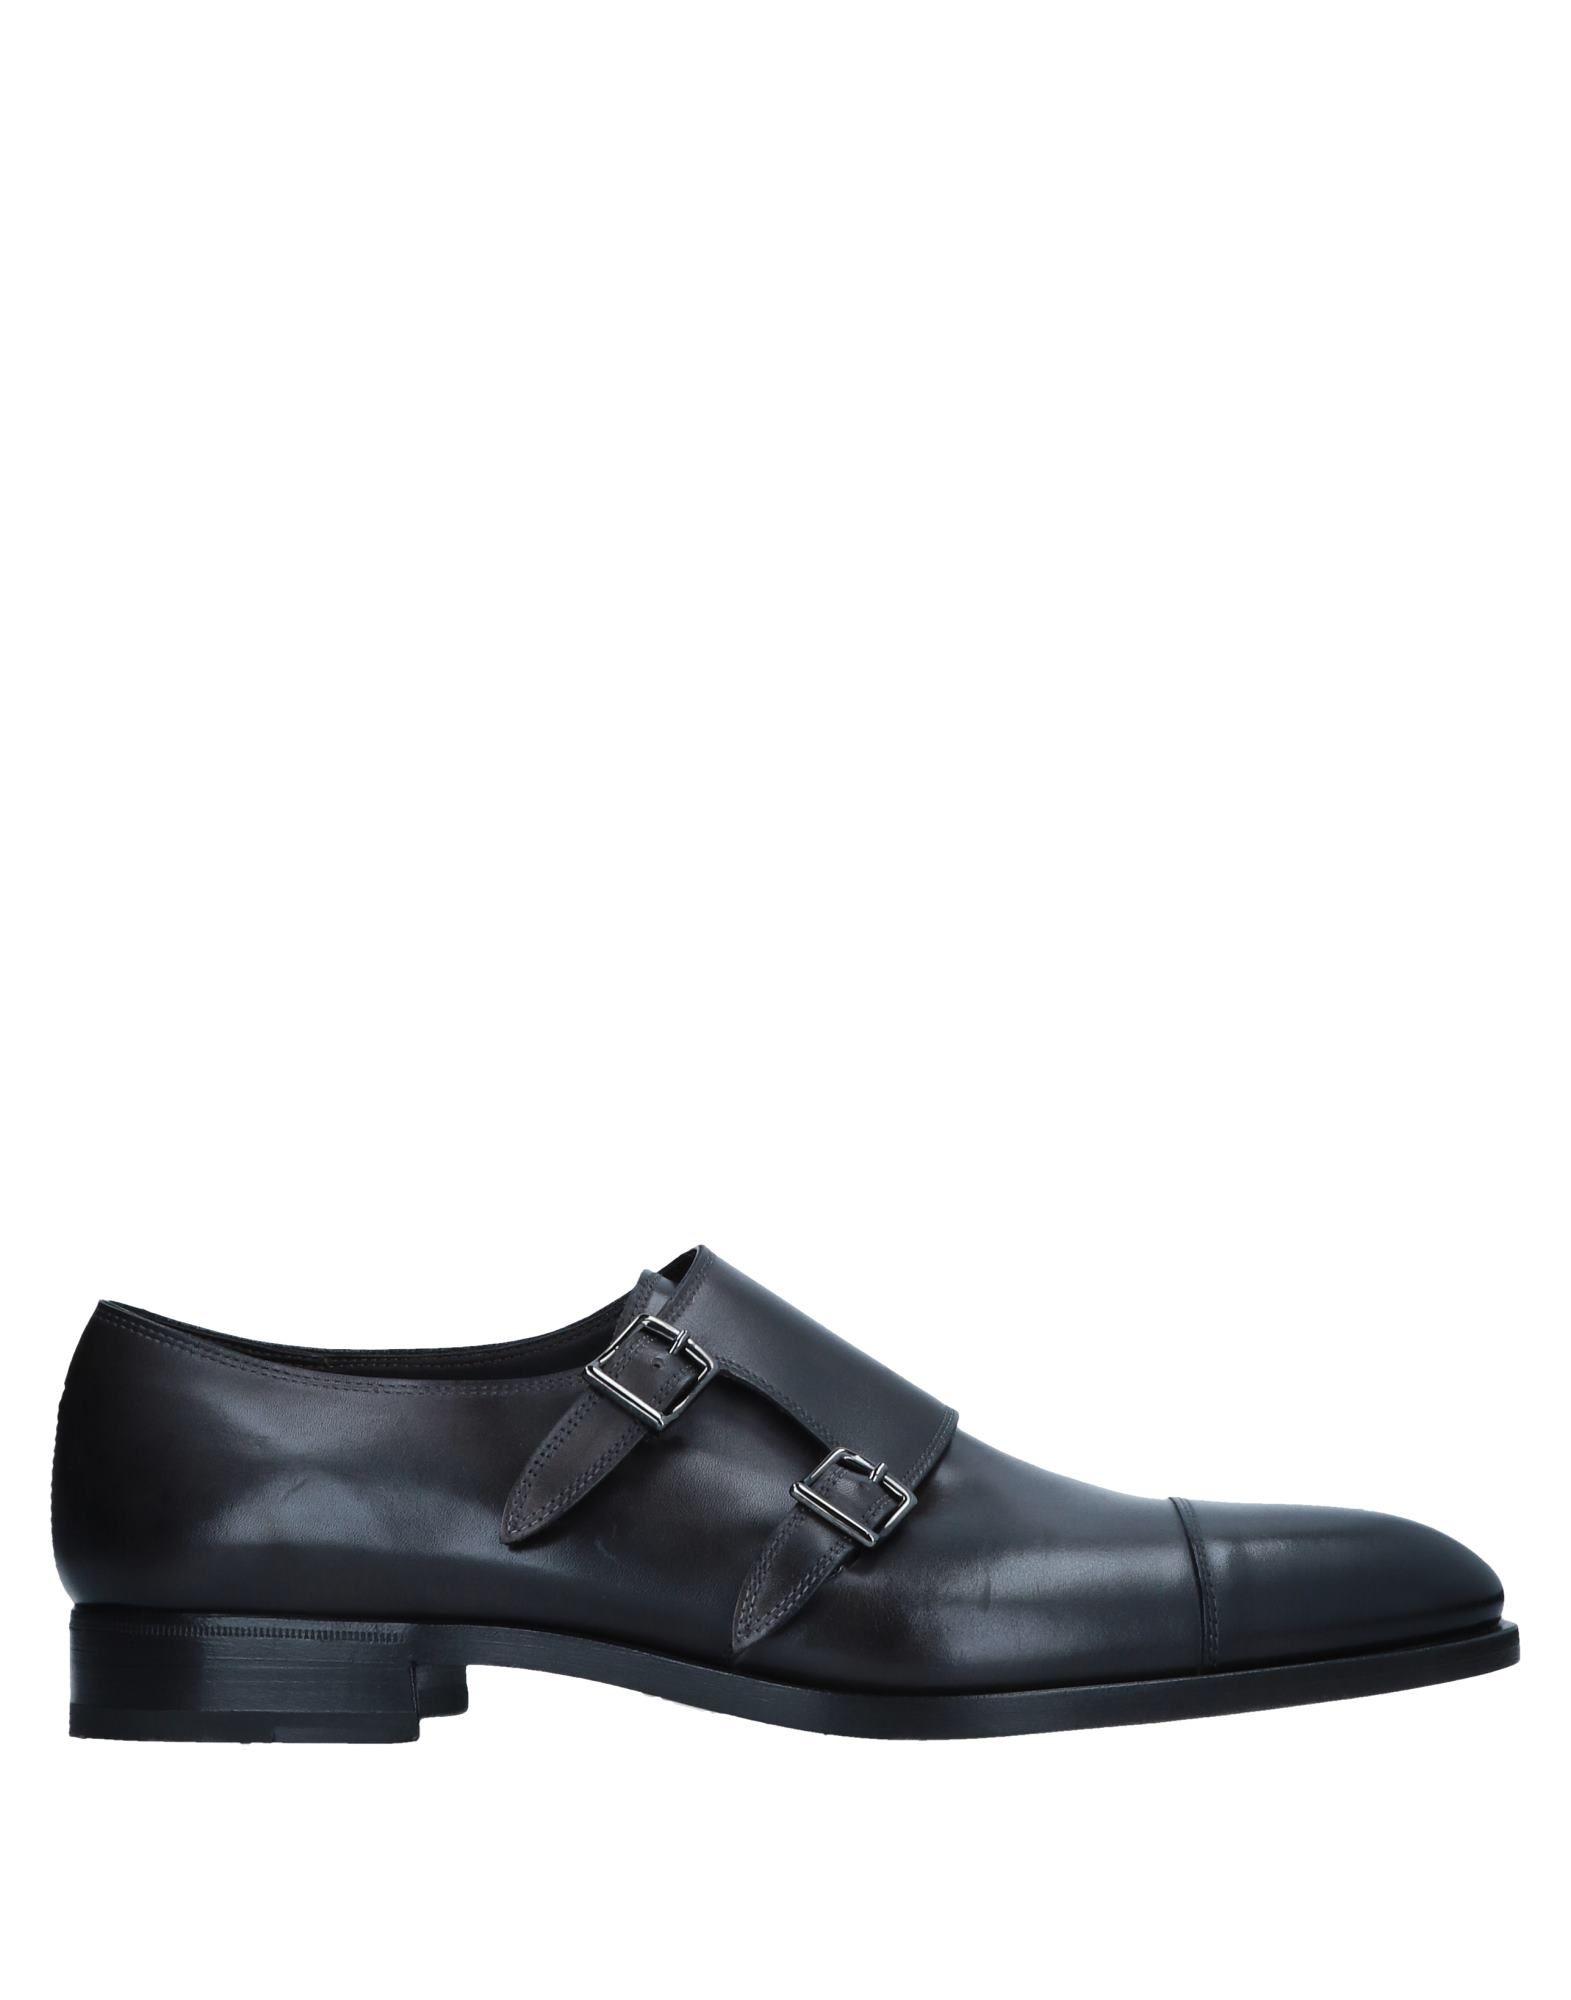 Fratelli Rossetti Mokassins Herren  11557986TK Gute Qualität beliebte Schuhe